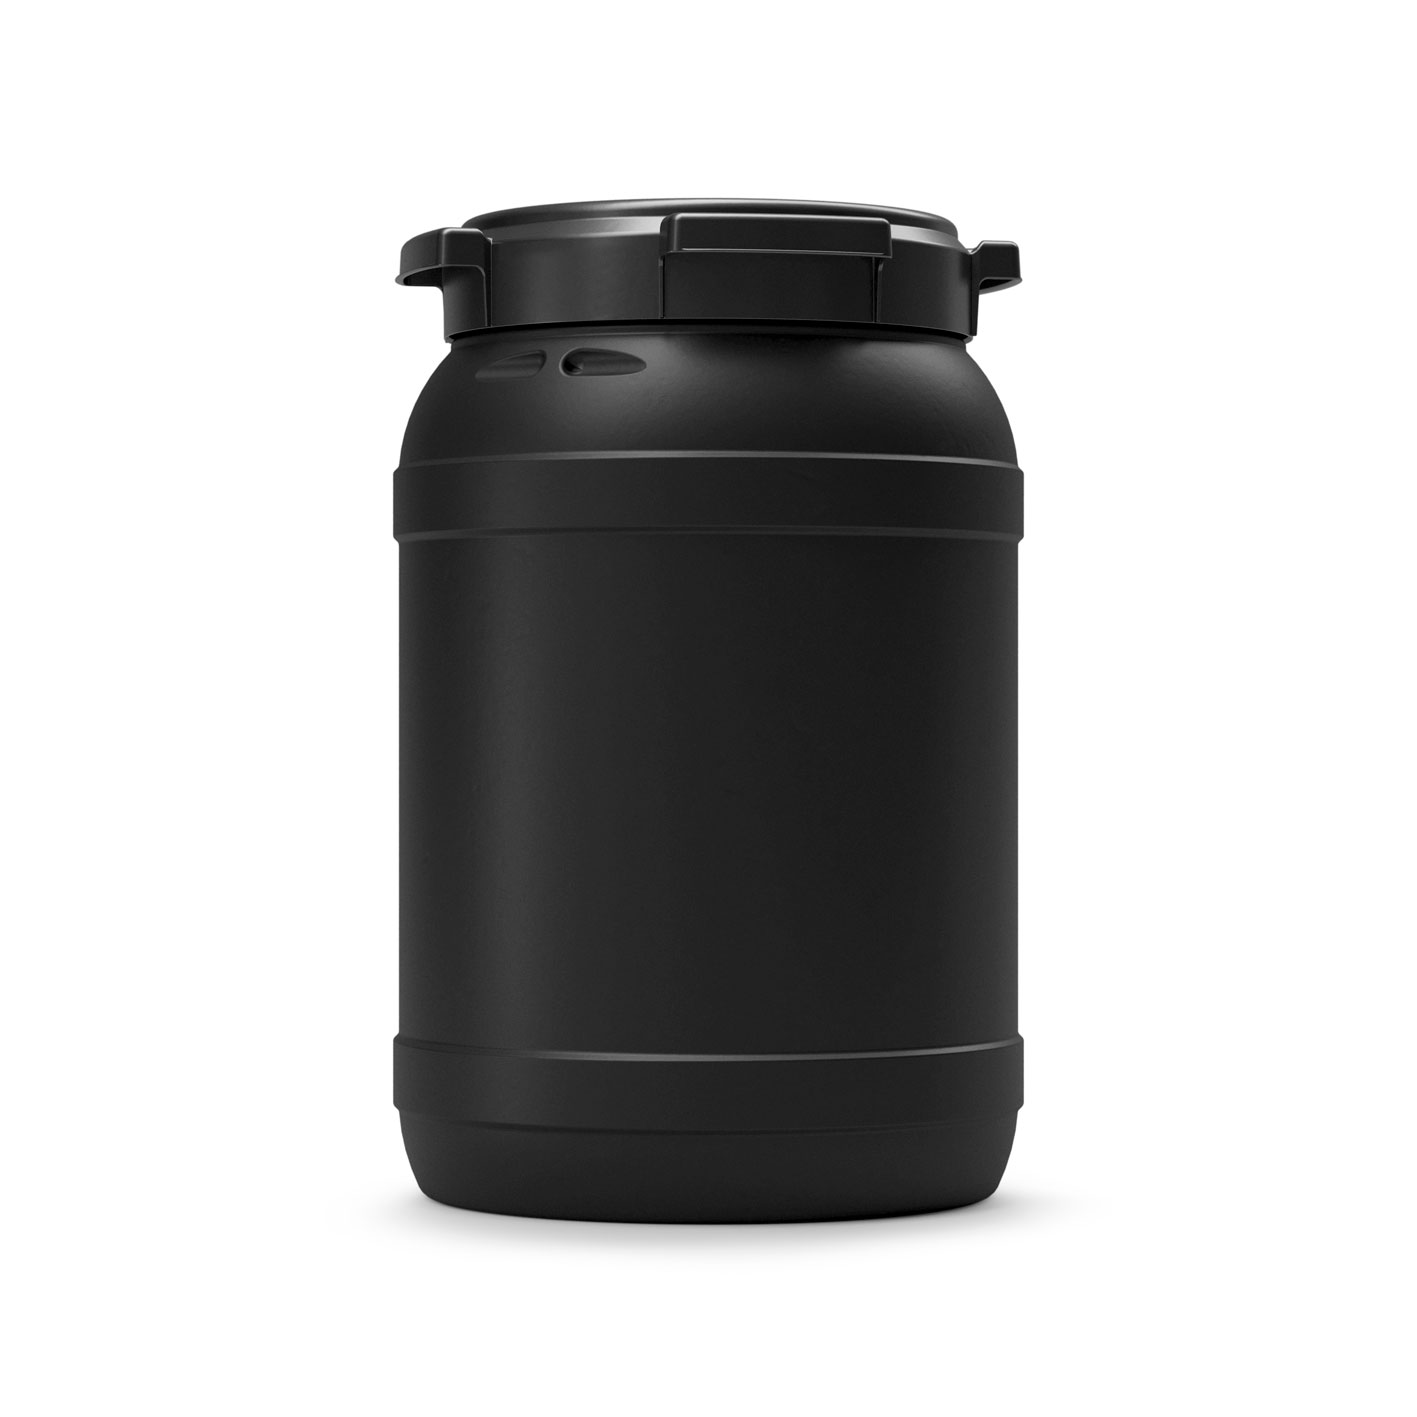 20 liter Conductive drum